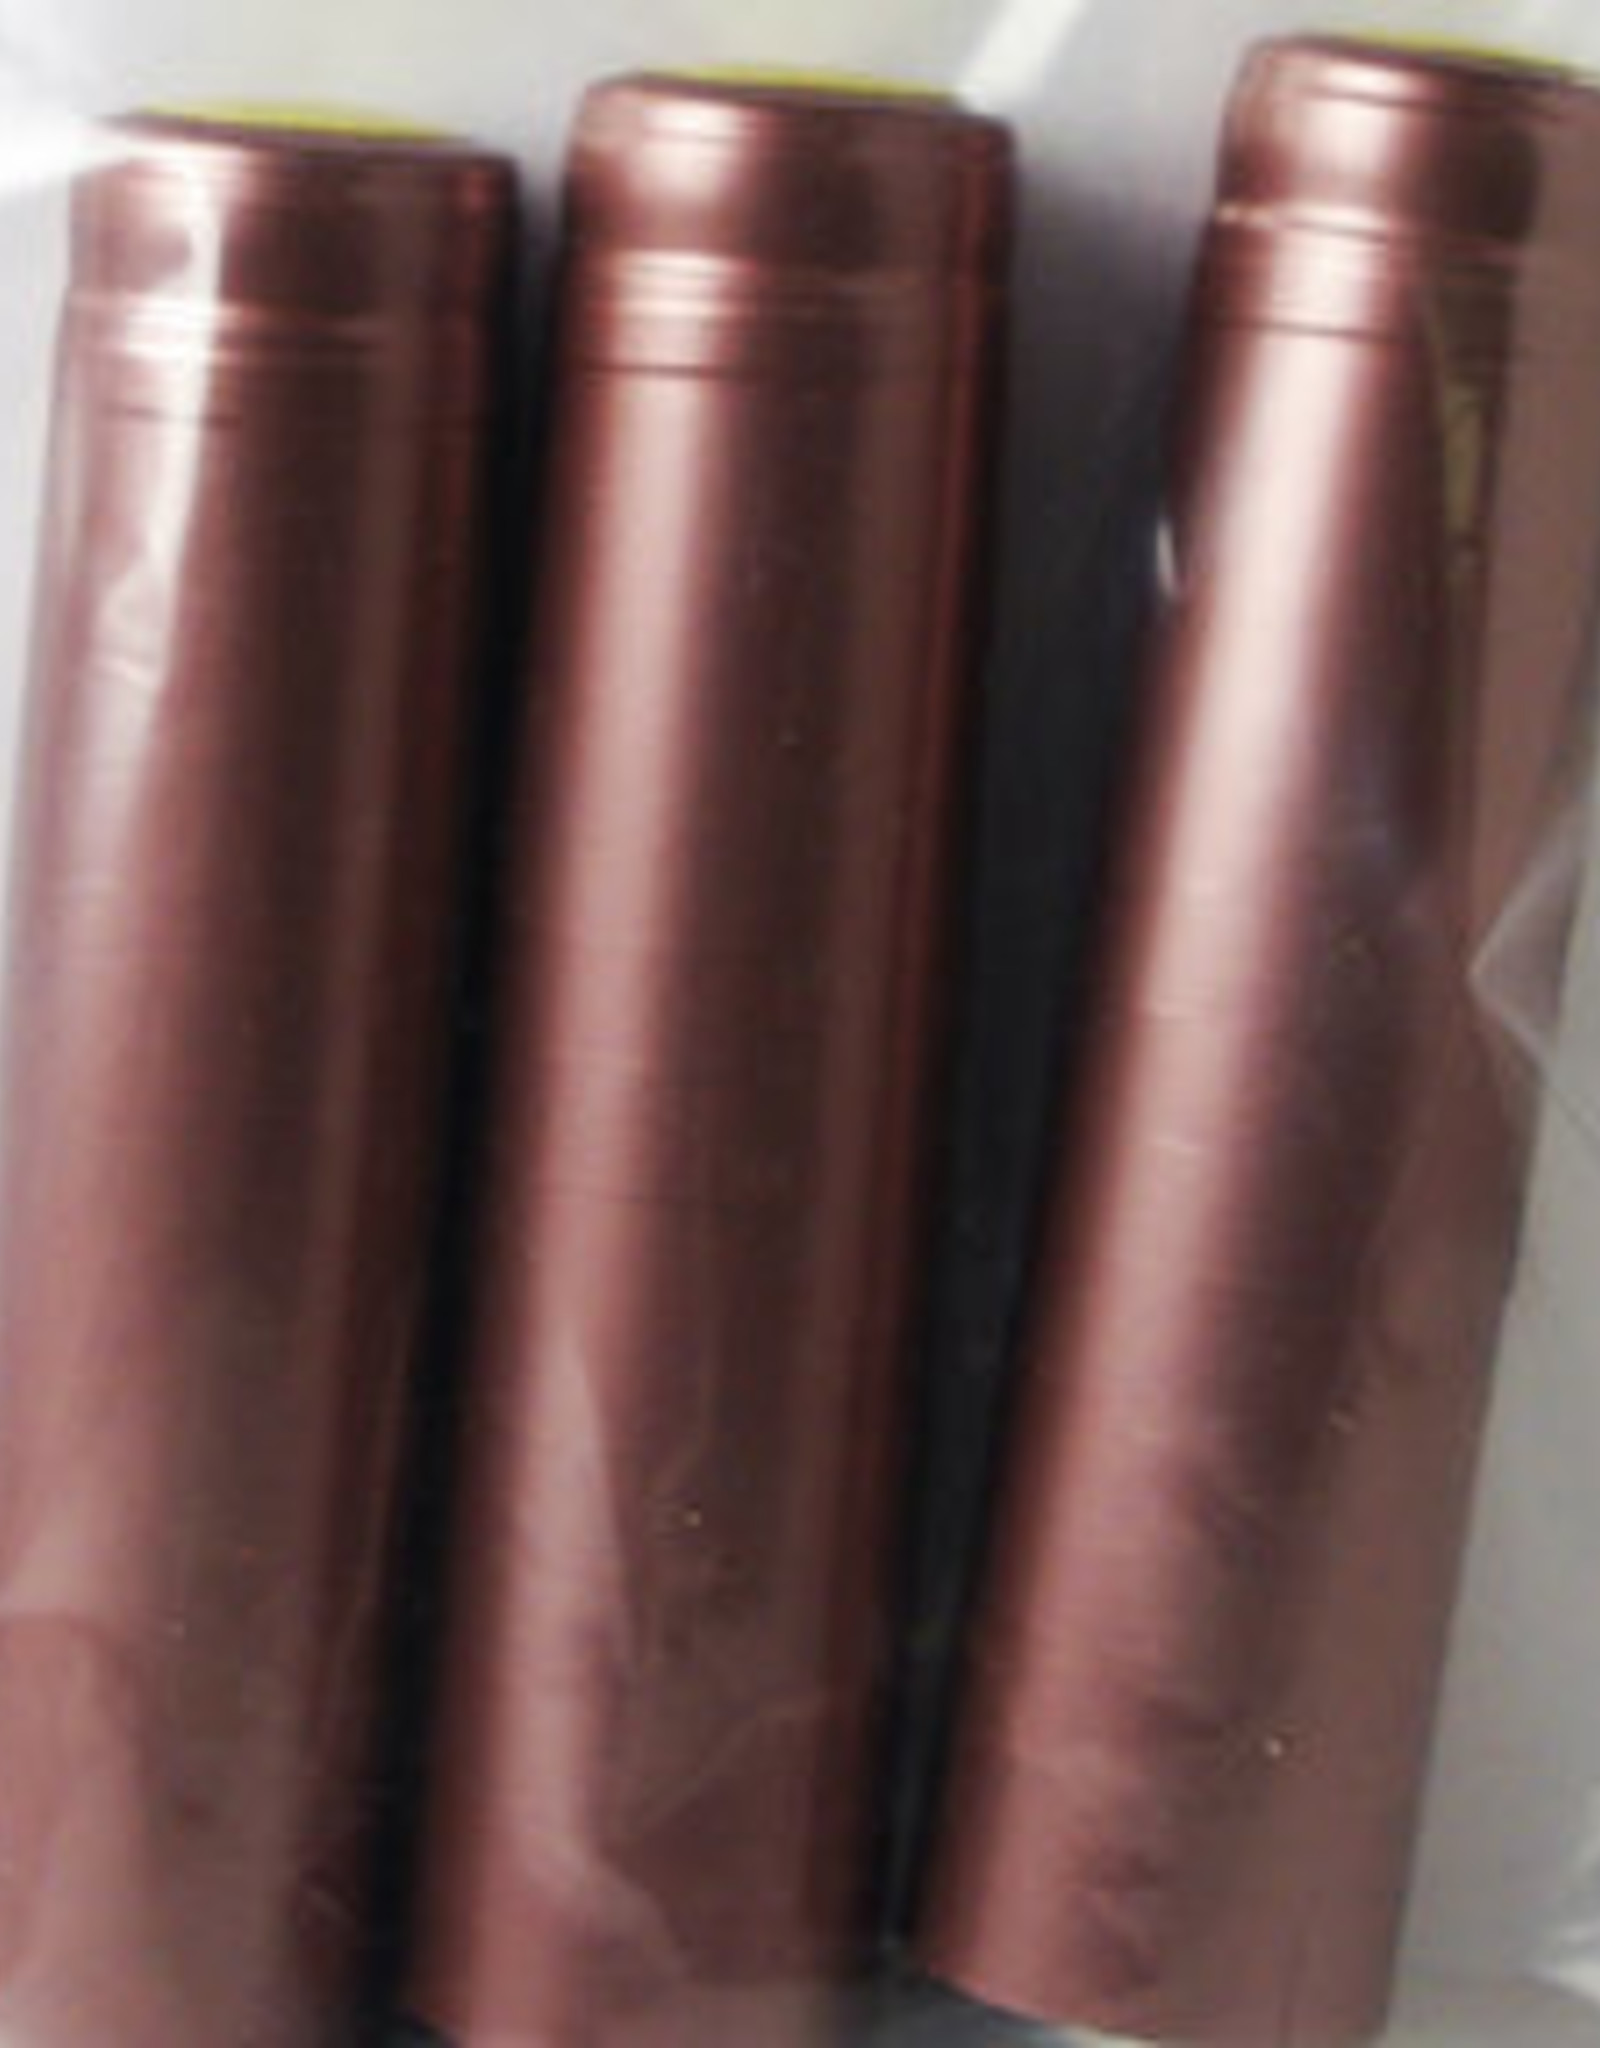 DUSTY ROSE PVC SHRINK CAPSULES 30/BAG